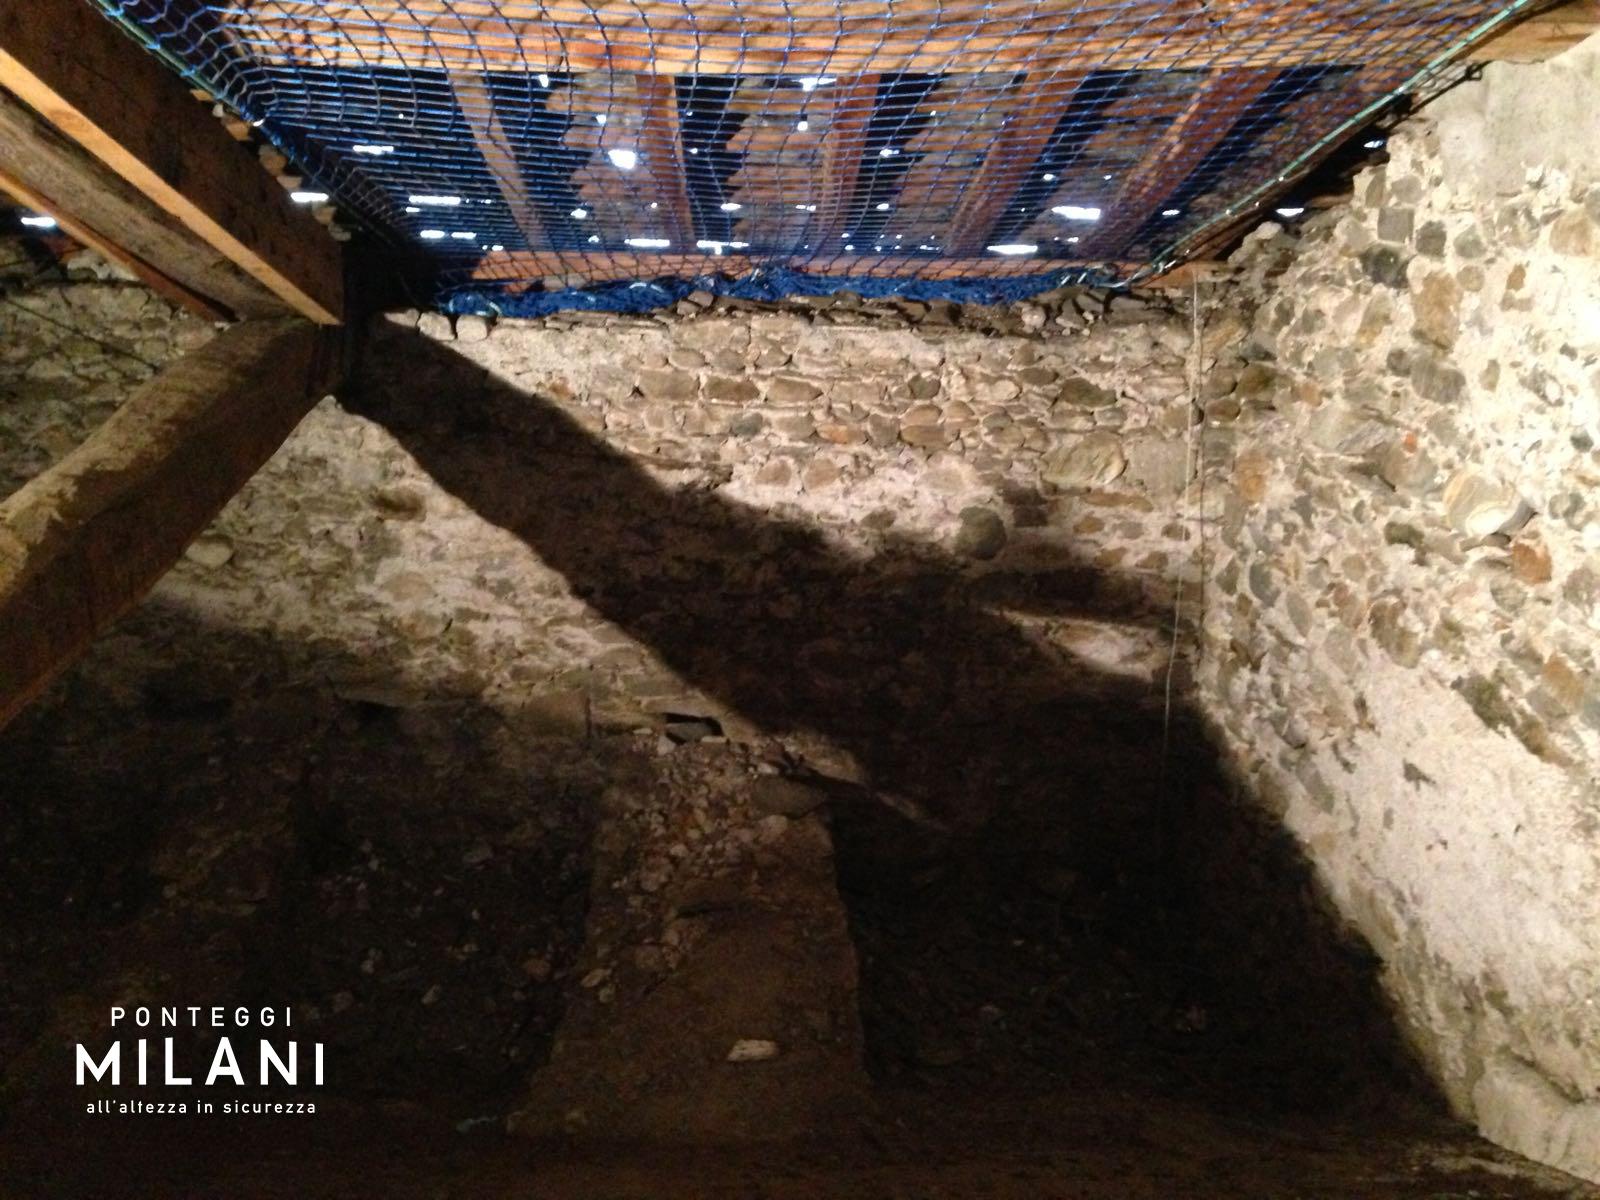 Ponteggi-Milani-reti-sottotetto-004